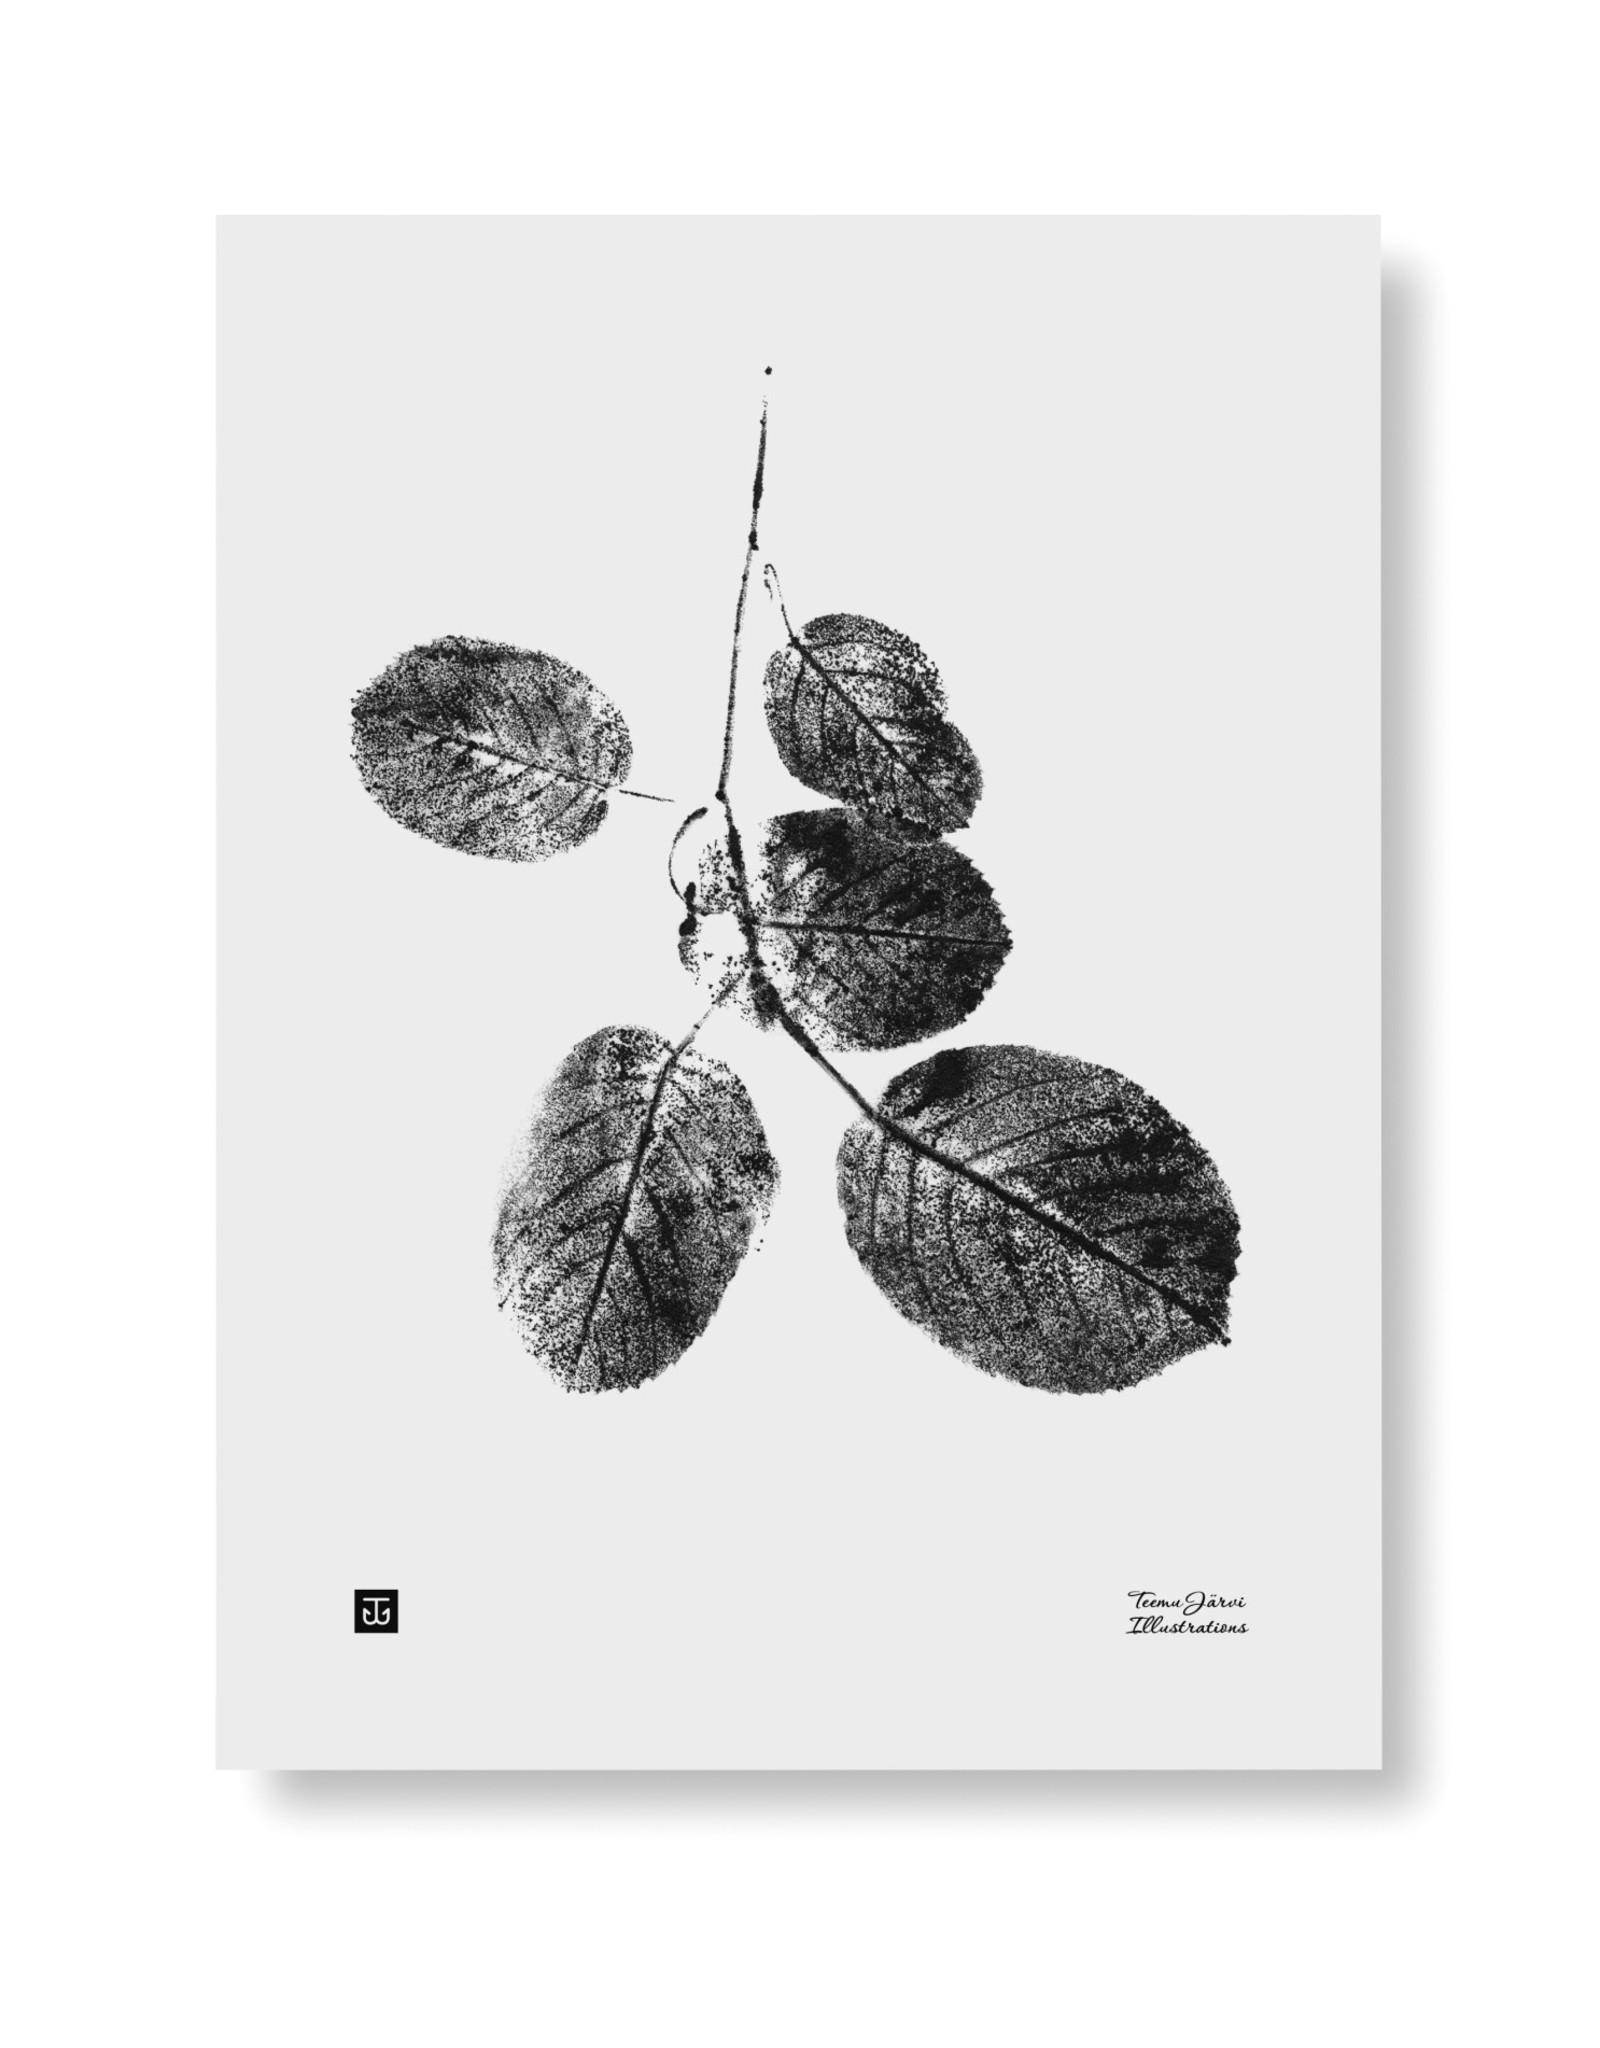 Teemu Jarvi Poster 'Goat Willow' 30x40 cm